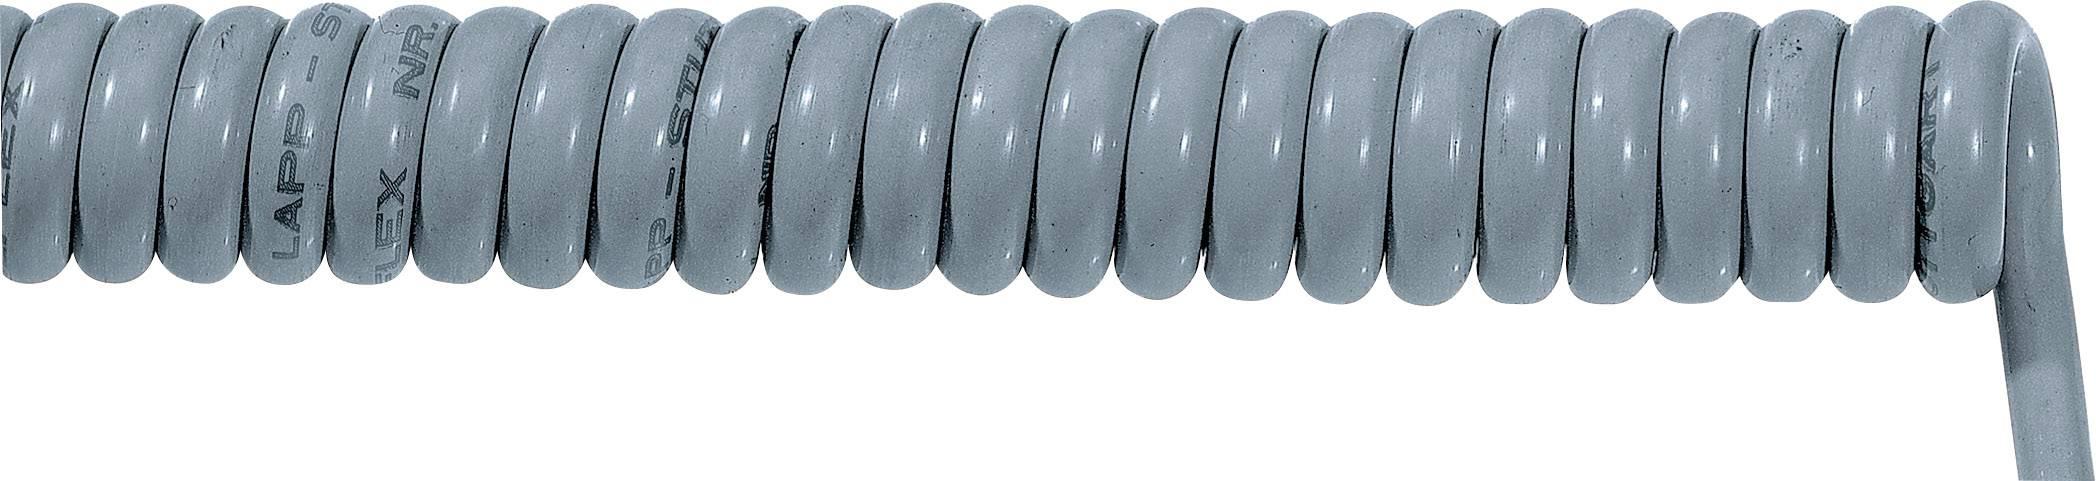 Spirálový kabel 73220333 UNITRONIC® SPIRAL LiF2Y11Y 12 x 0.14 mm², 400 mm / 1600 mm, šedá